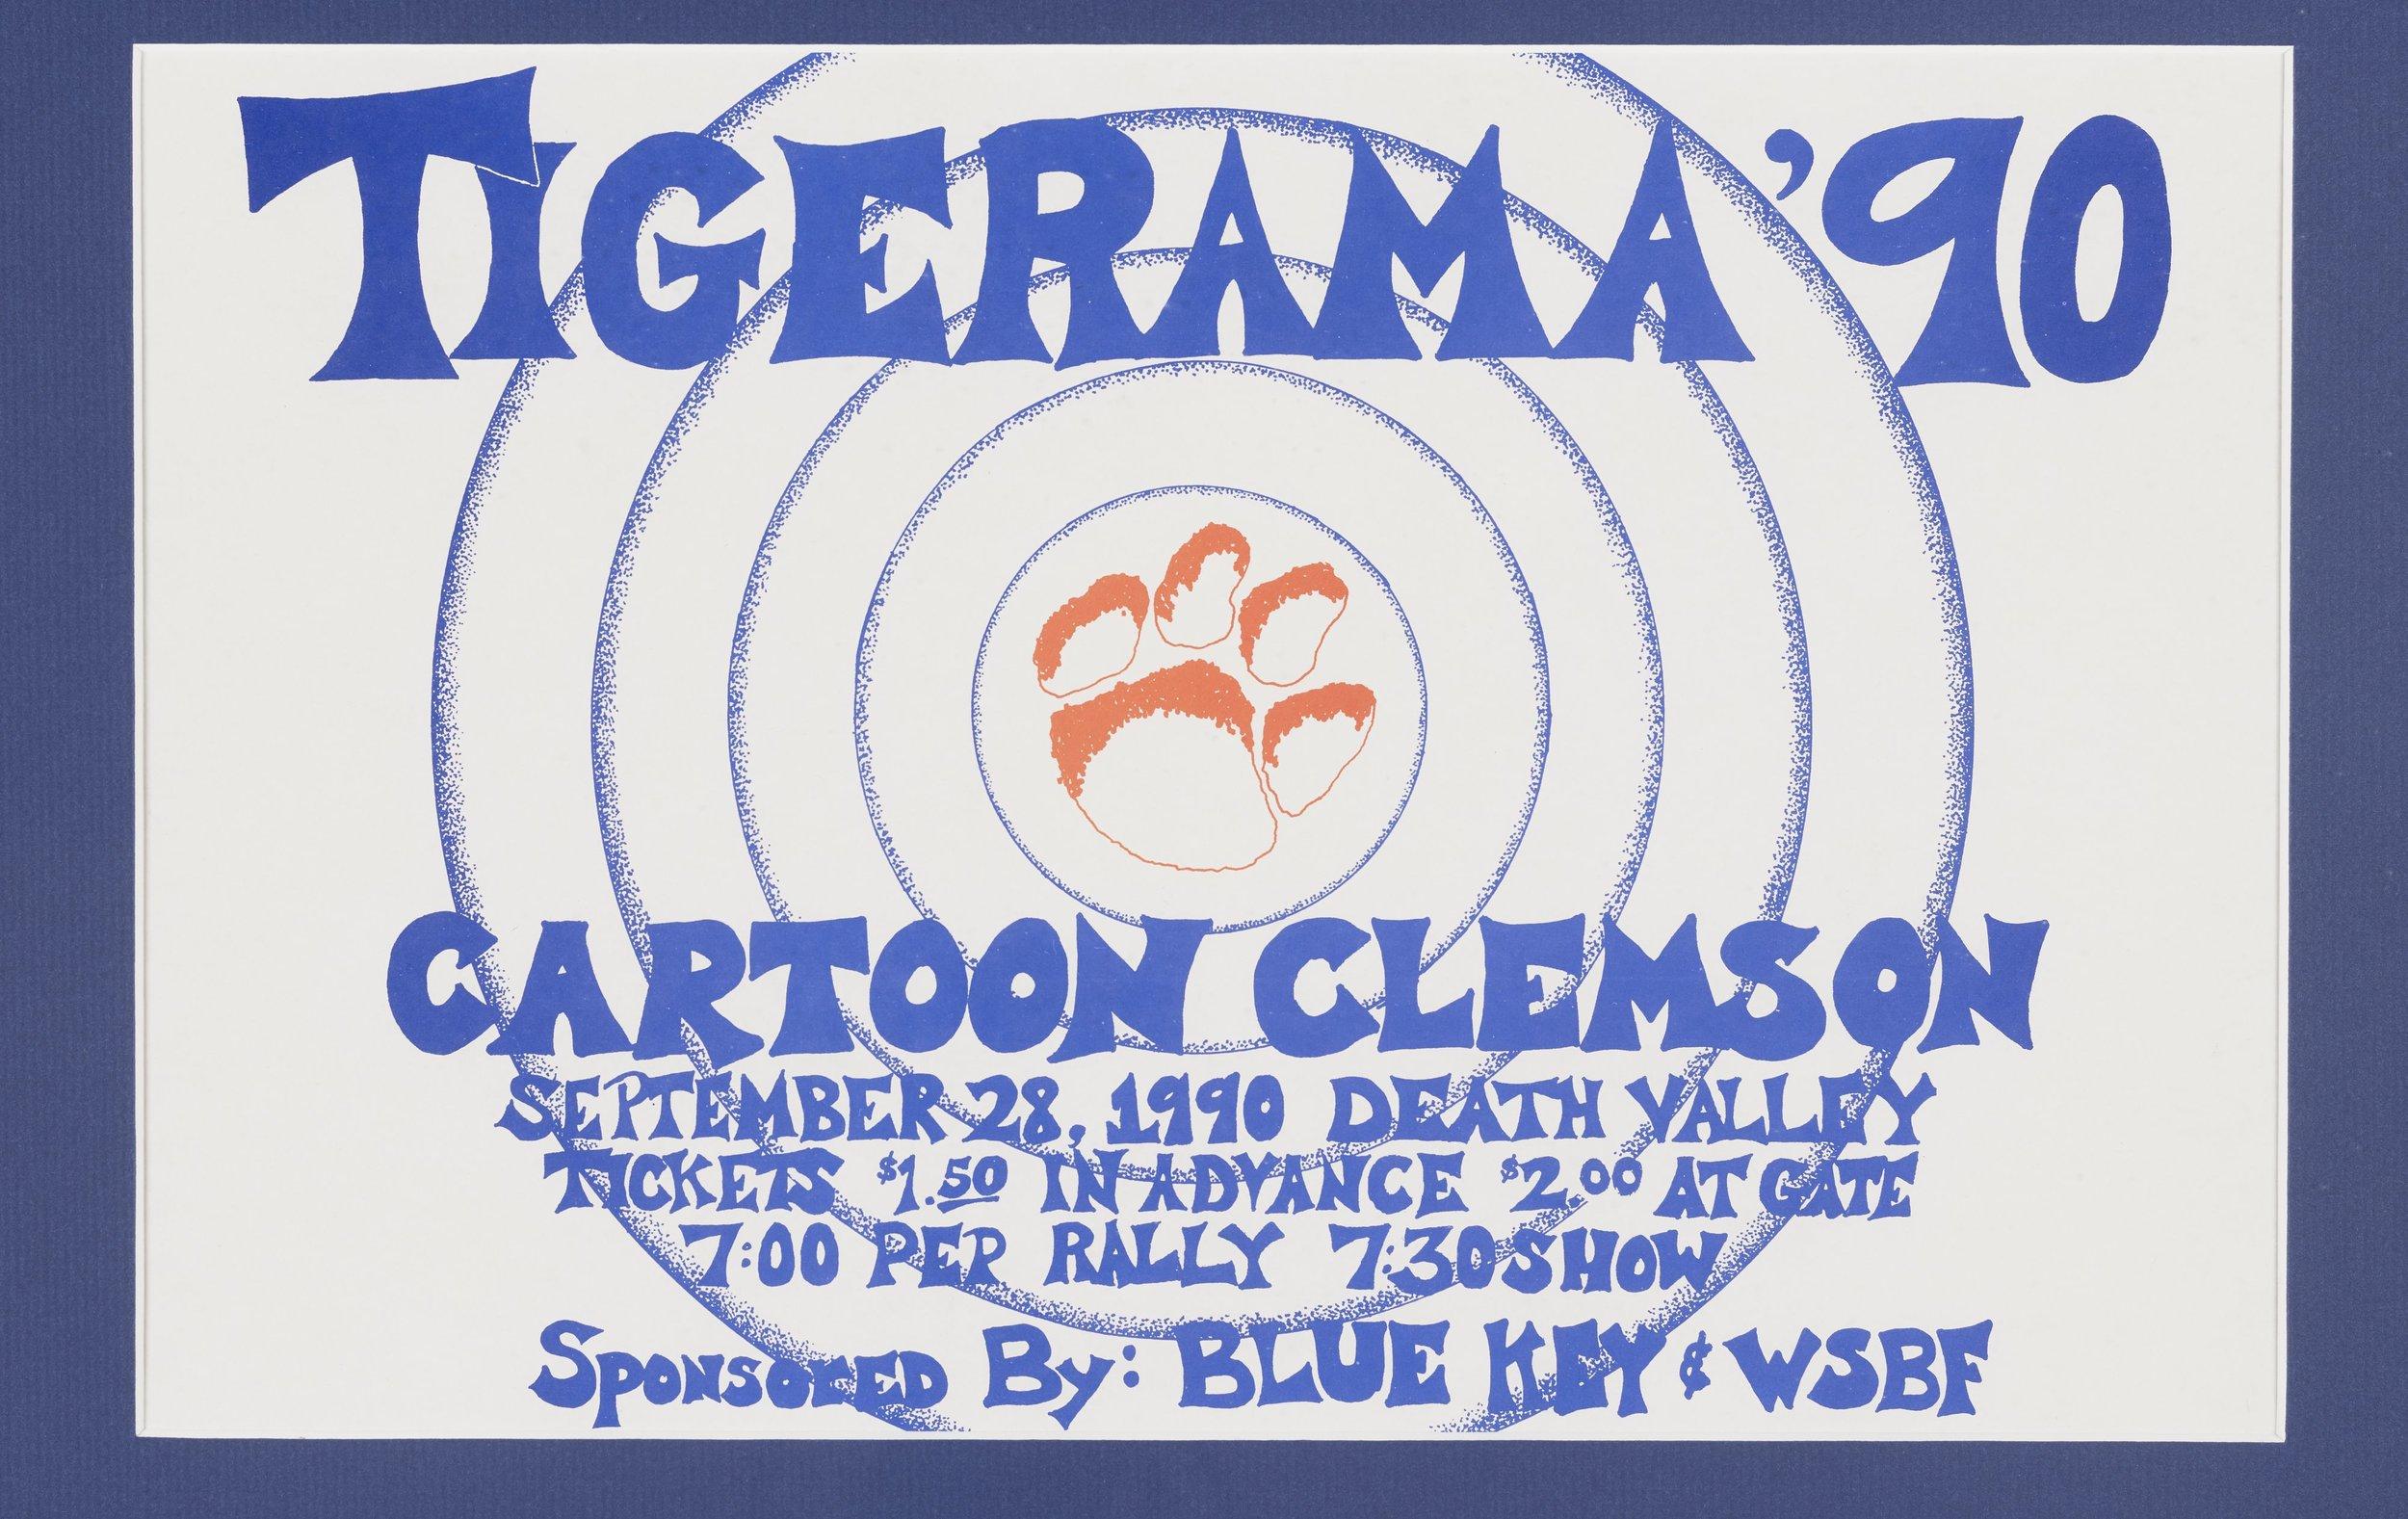 Tigerama 1990